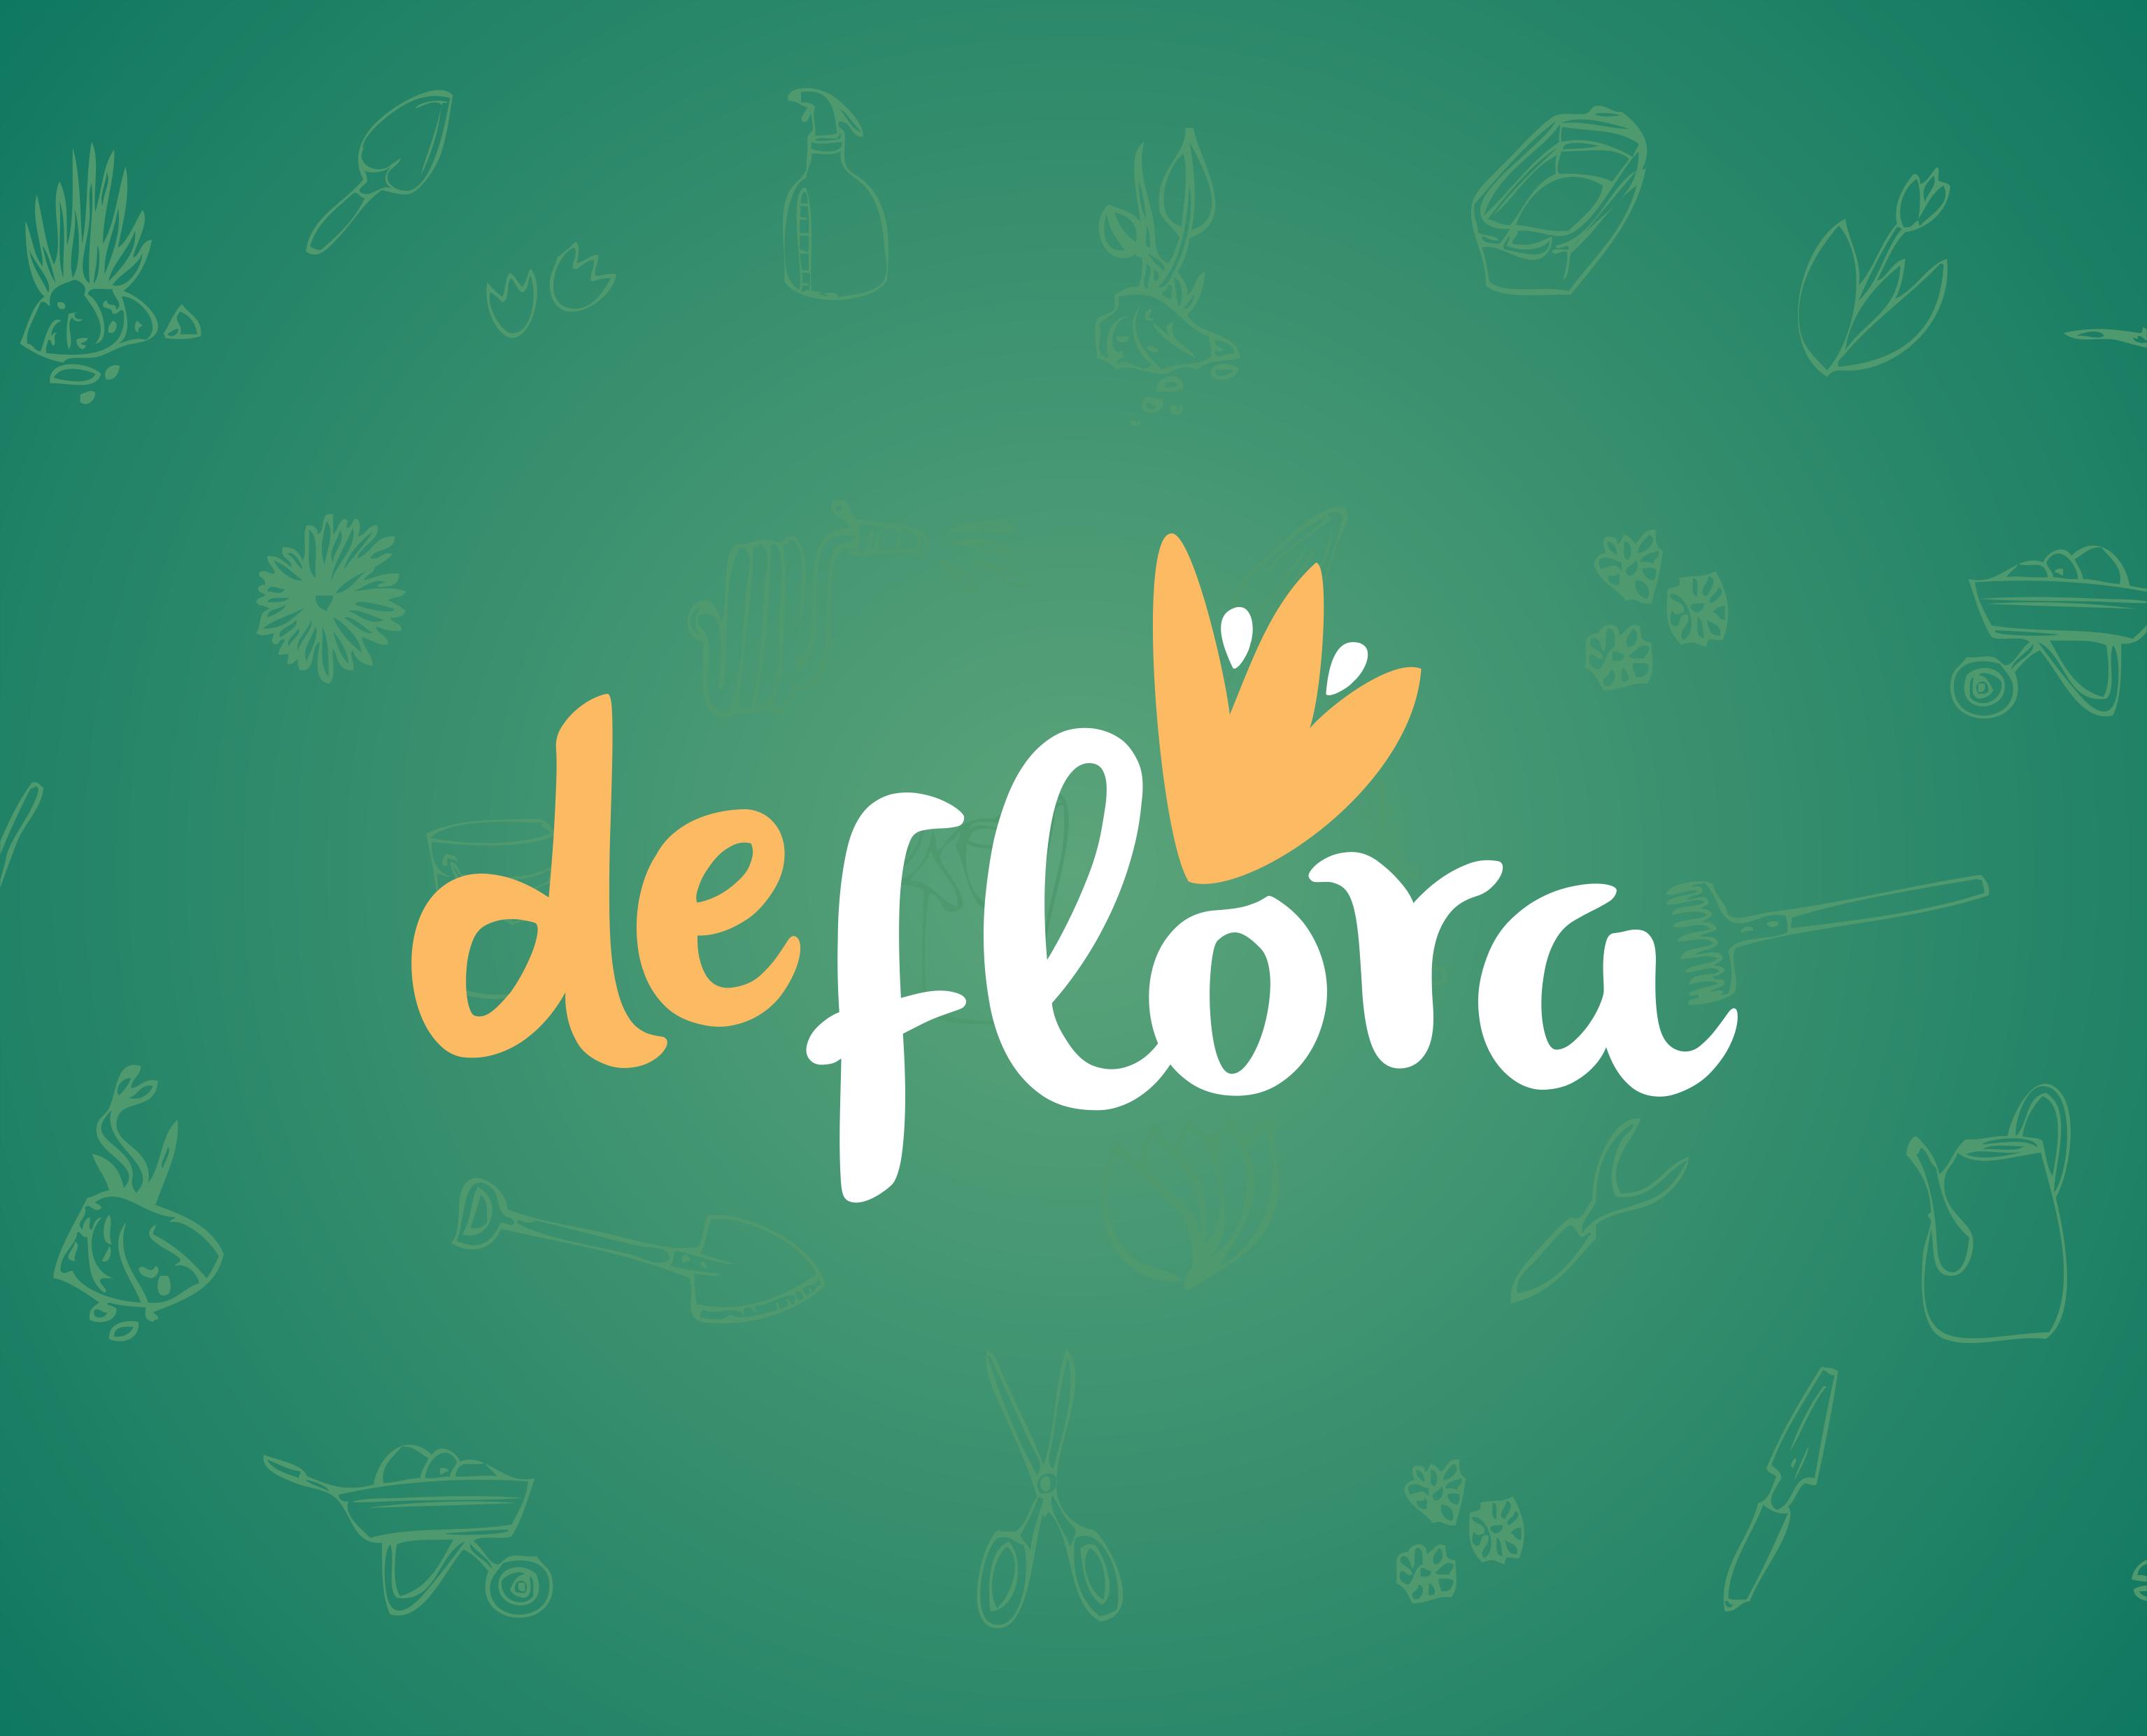 Projeto De Flora - Corel